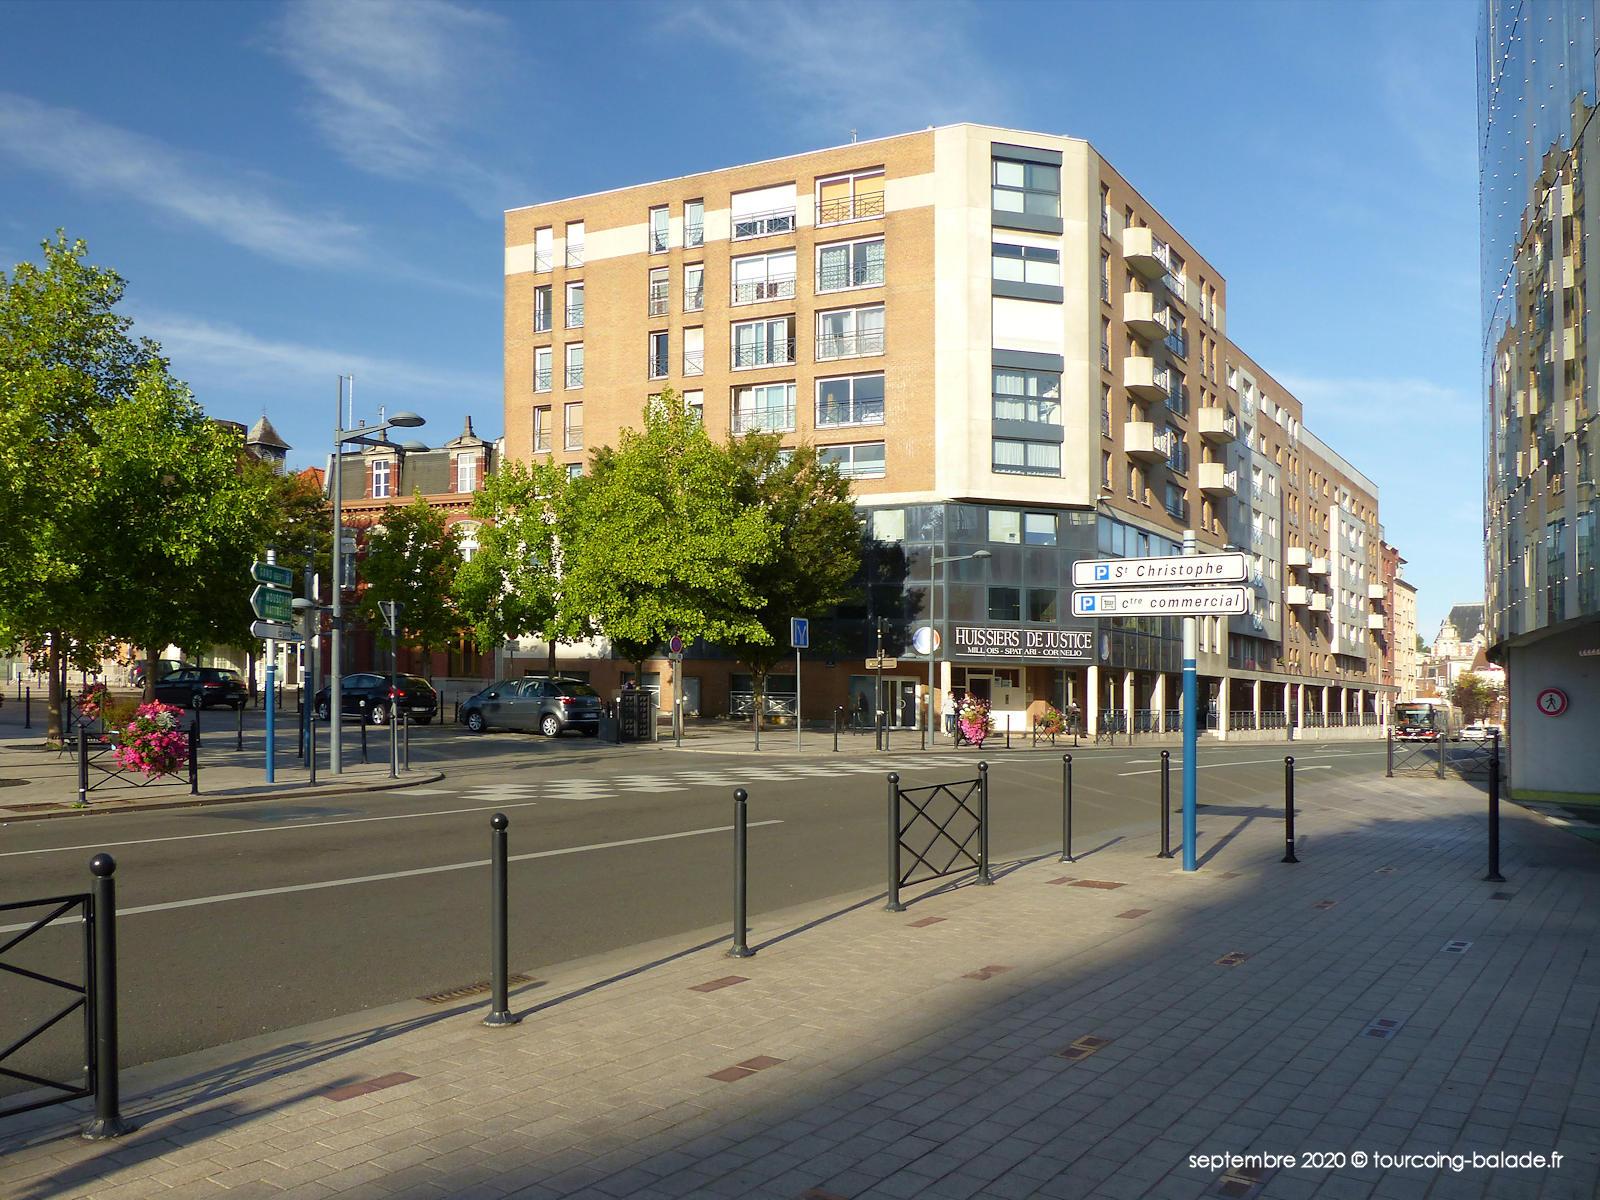 Résidence Faidherbe, Tourcoing 2020